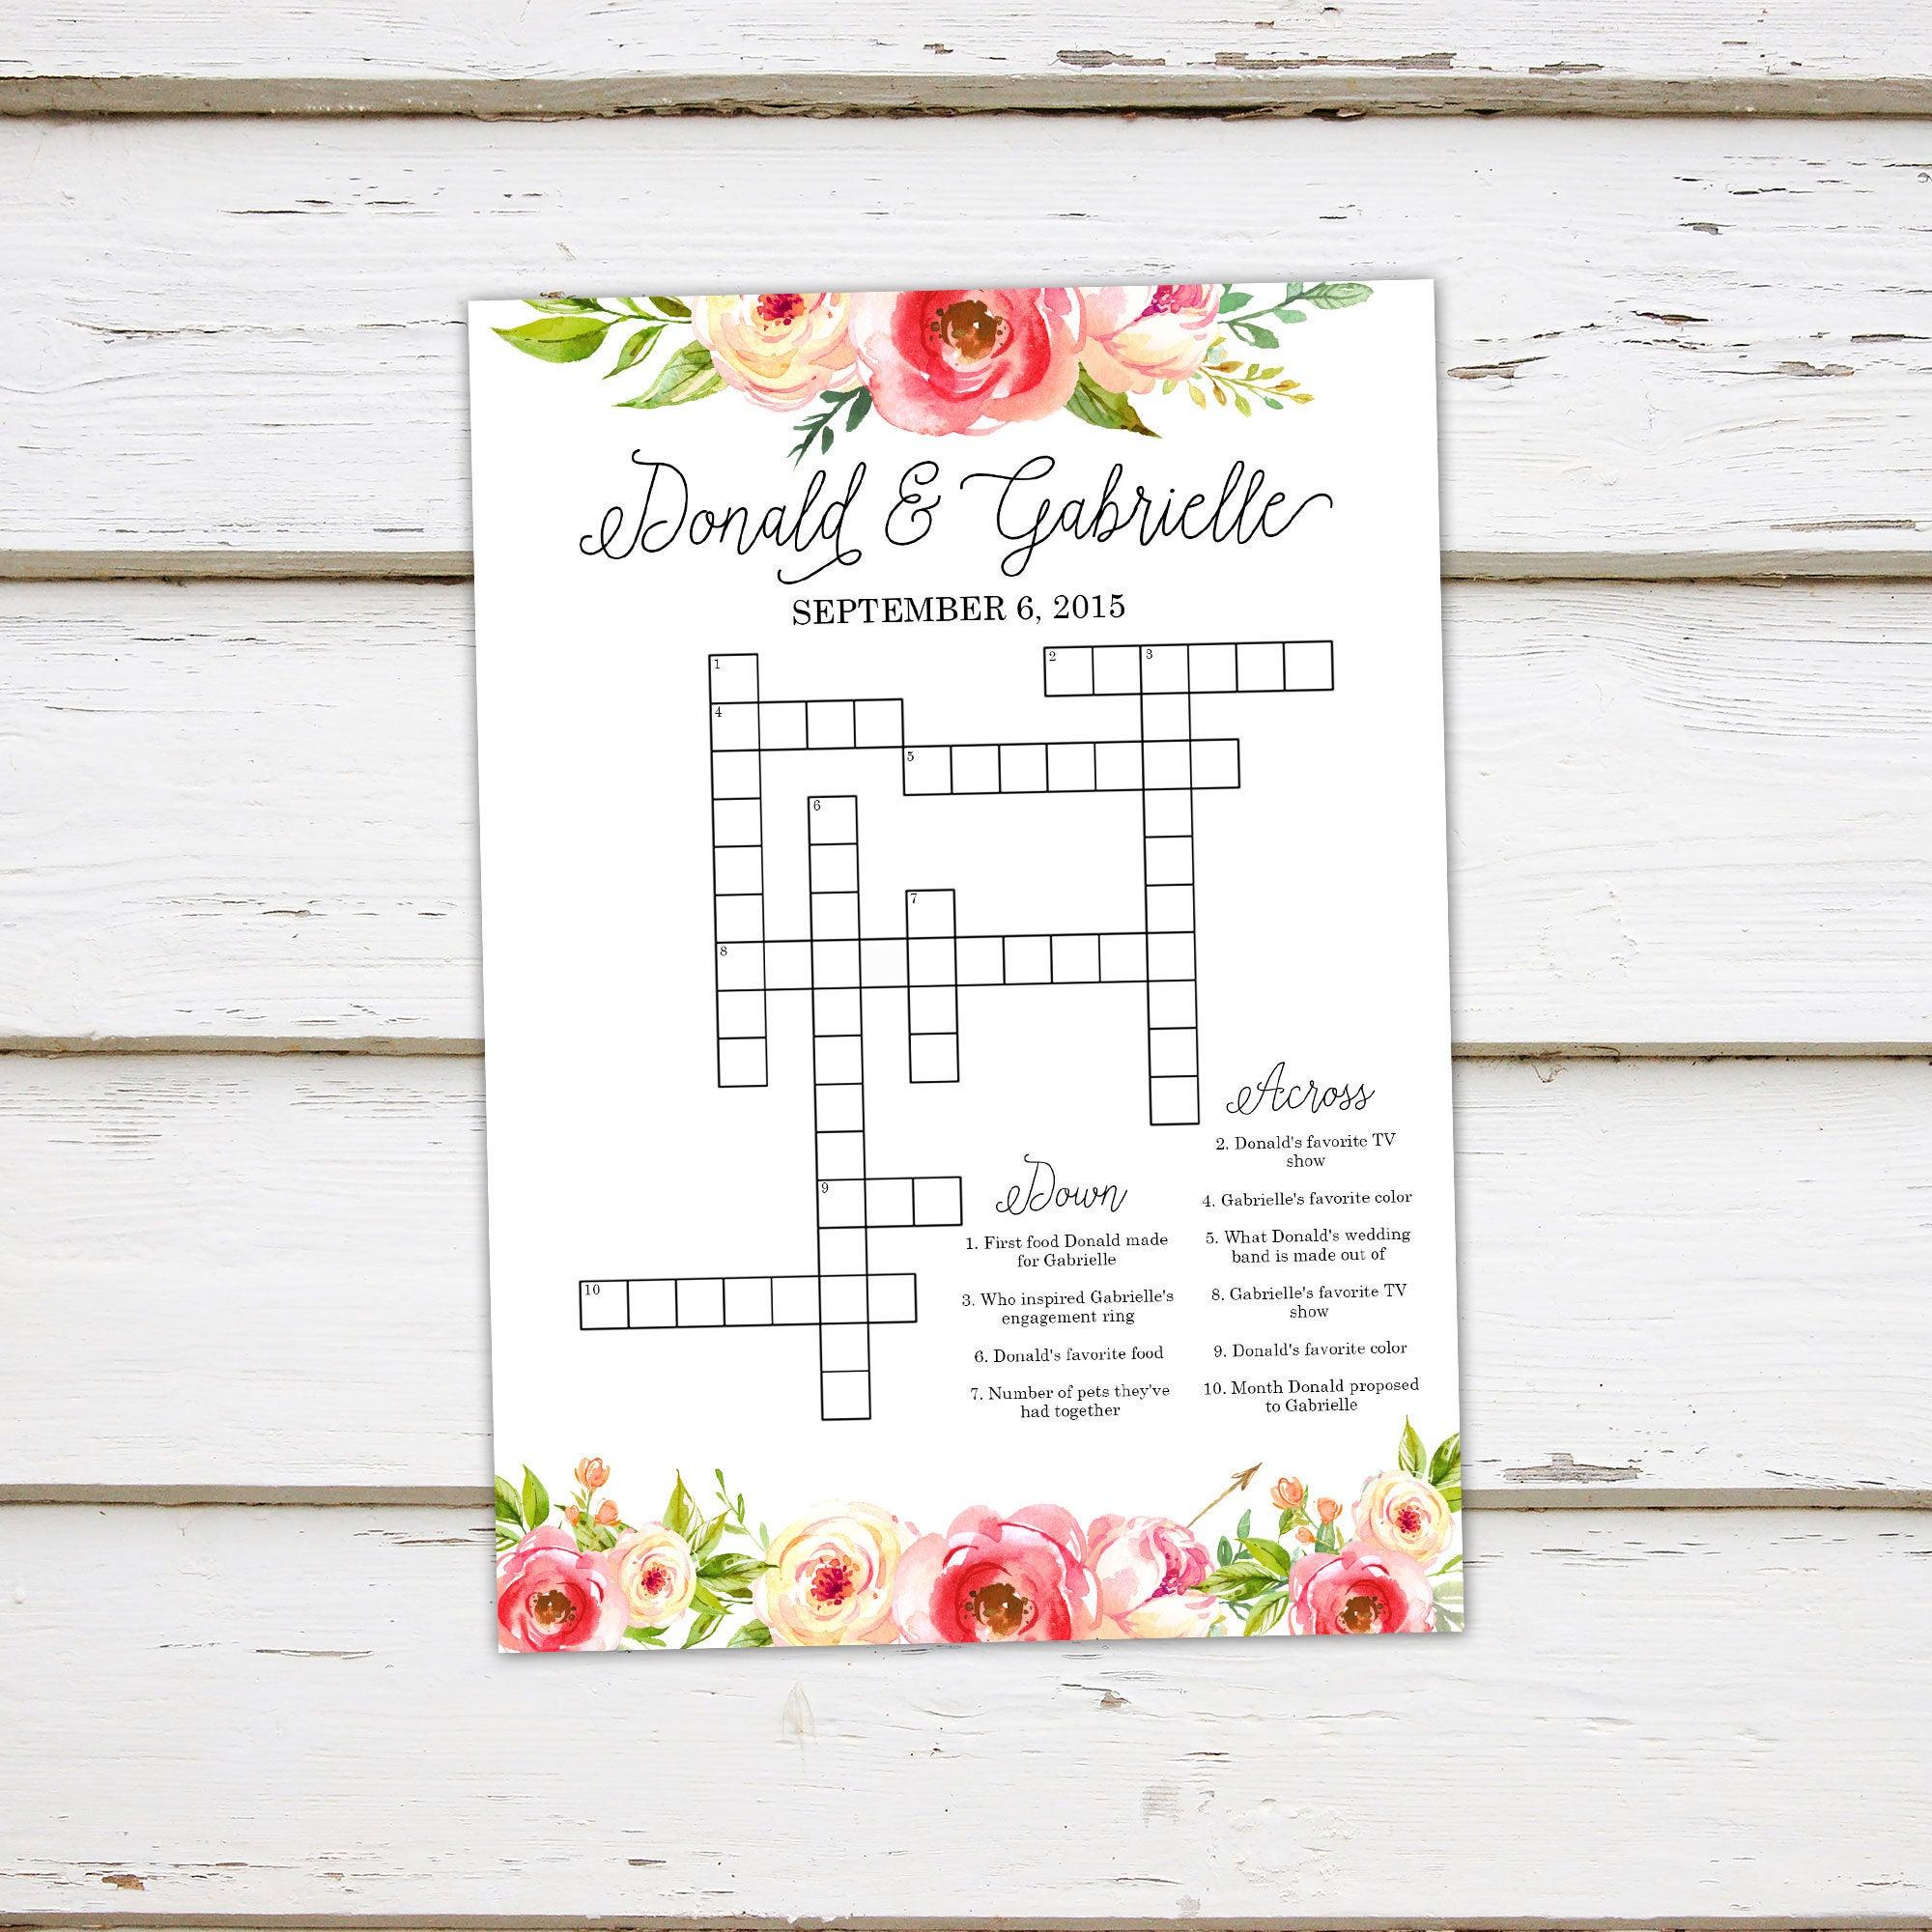 Printable Wedding Crossword Puzzle Game Games For Wedding | Etsy - Free Printable Wedding Crossword Puzzle